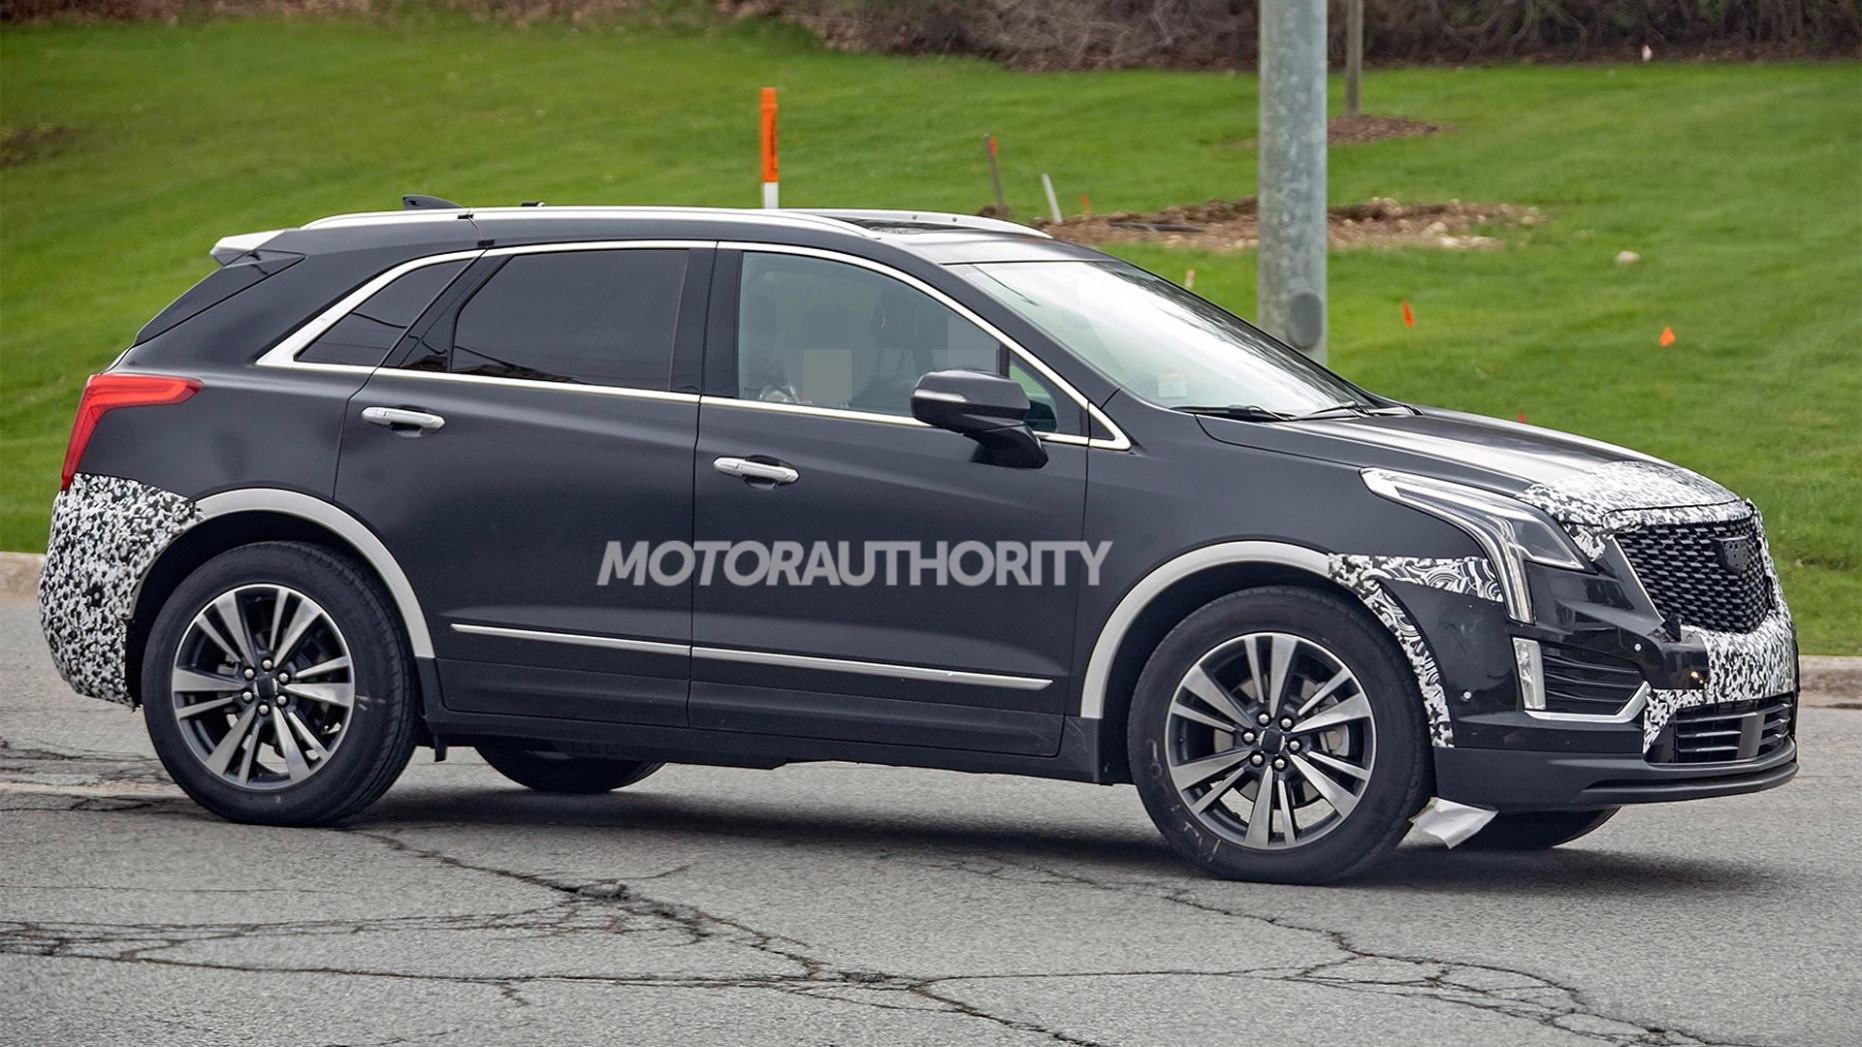 Overview 2022 Spy Shots Cadillac Xt5